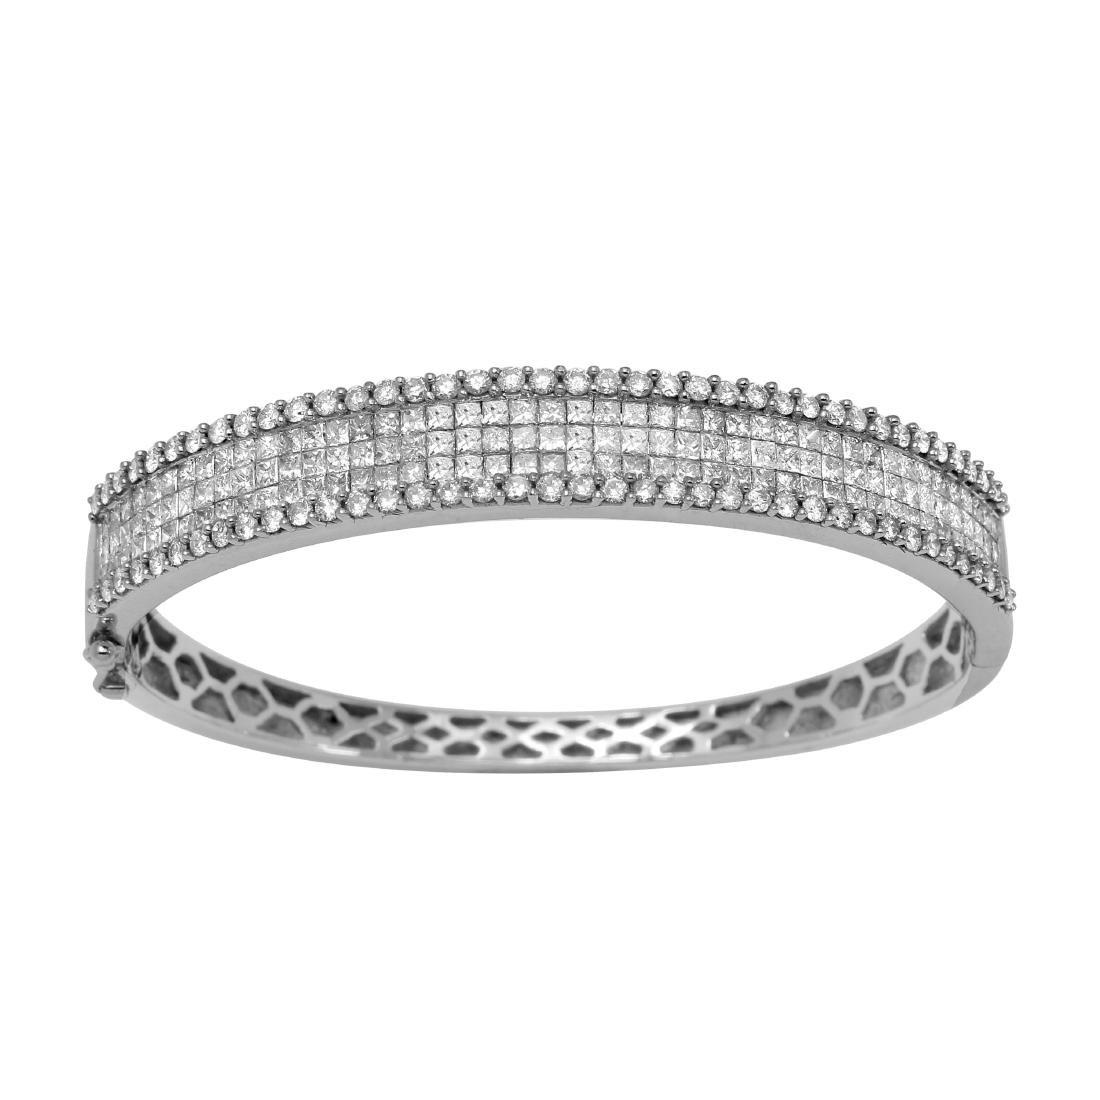 5.44ct Diamond 14K White Gold Bracelet